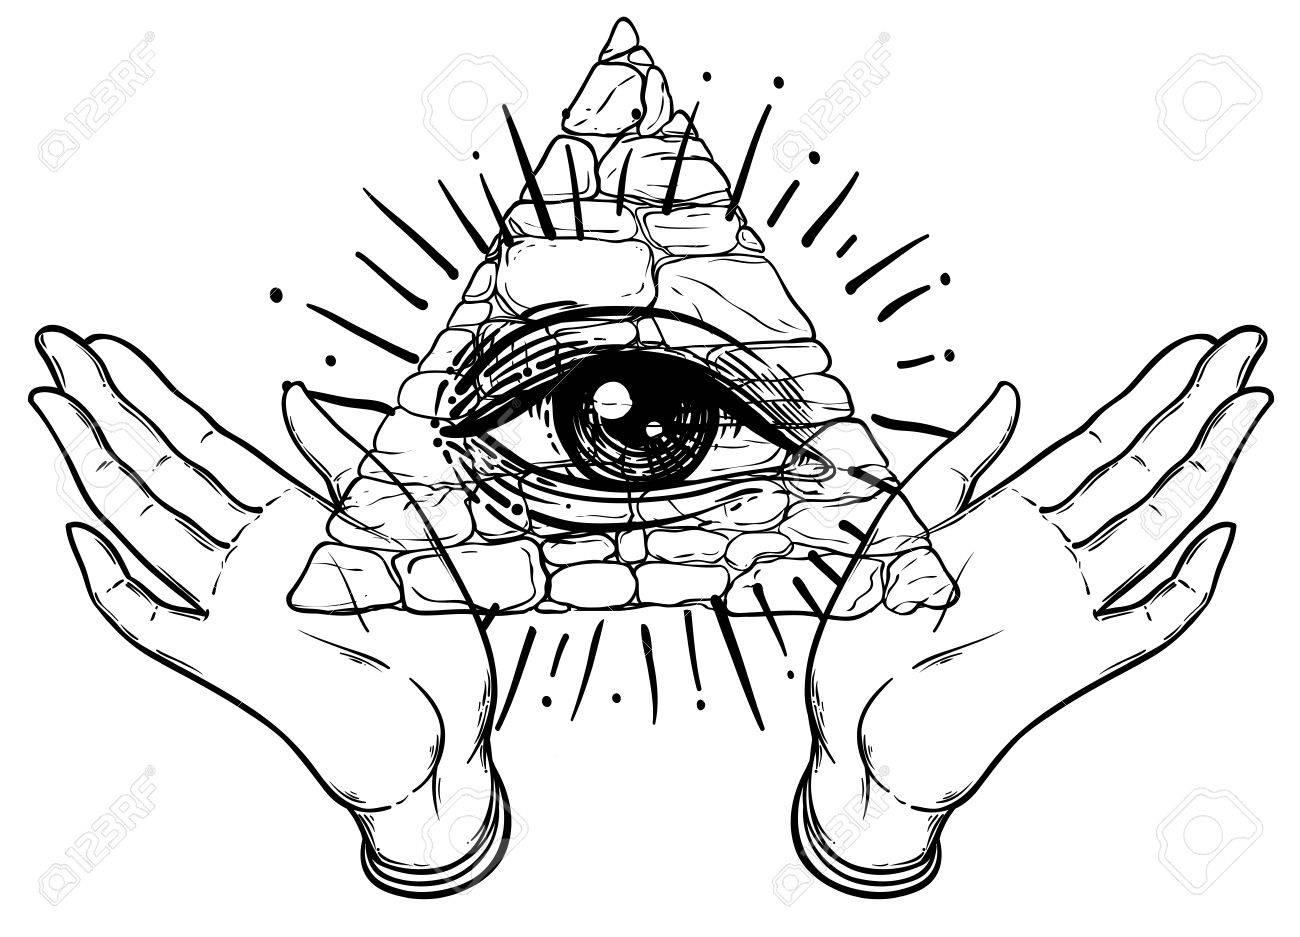 Female hands open around masonic symbol new world order hand drawn female hands open around masonic symbol new world order hand drawn alchemy biocorpaavc Gallery